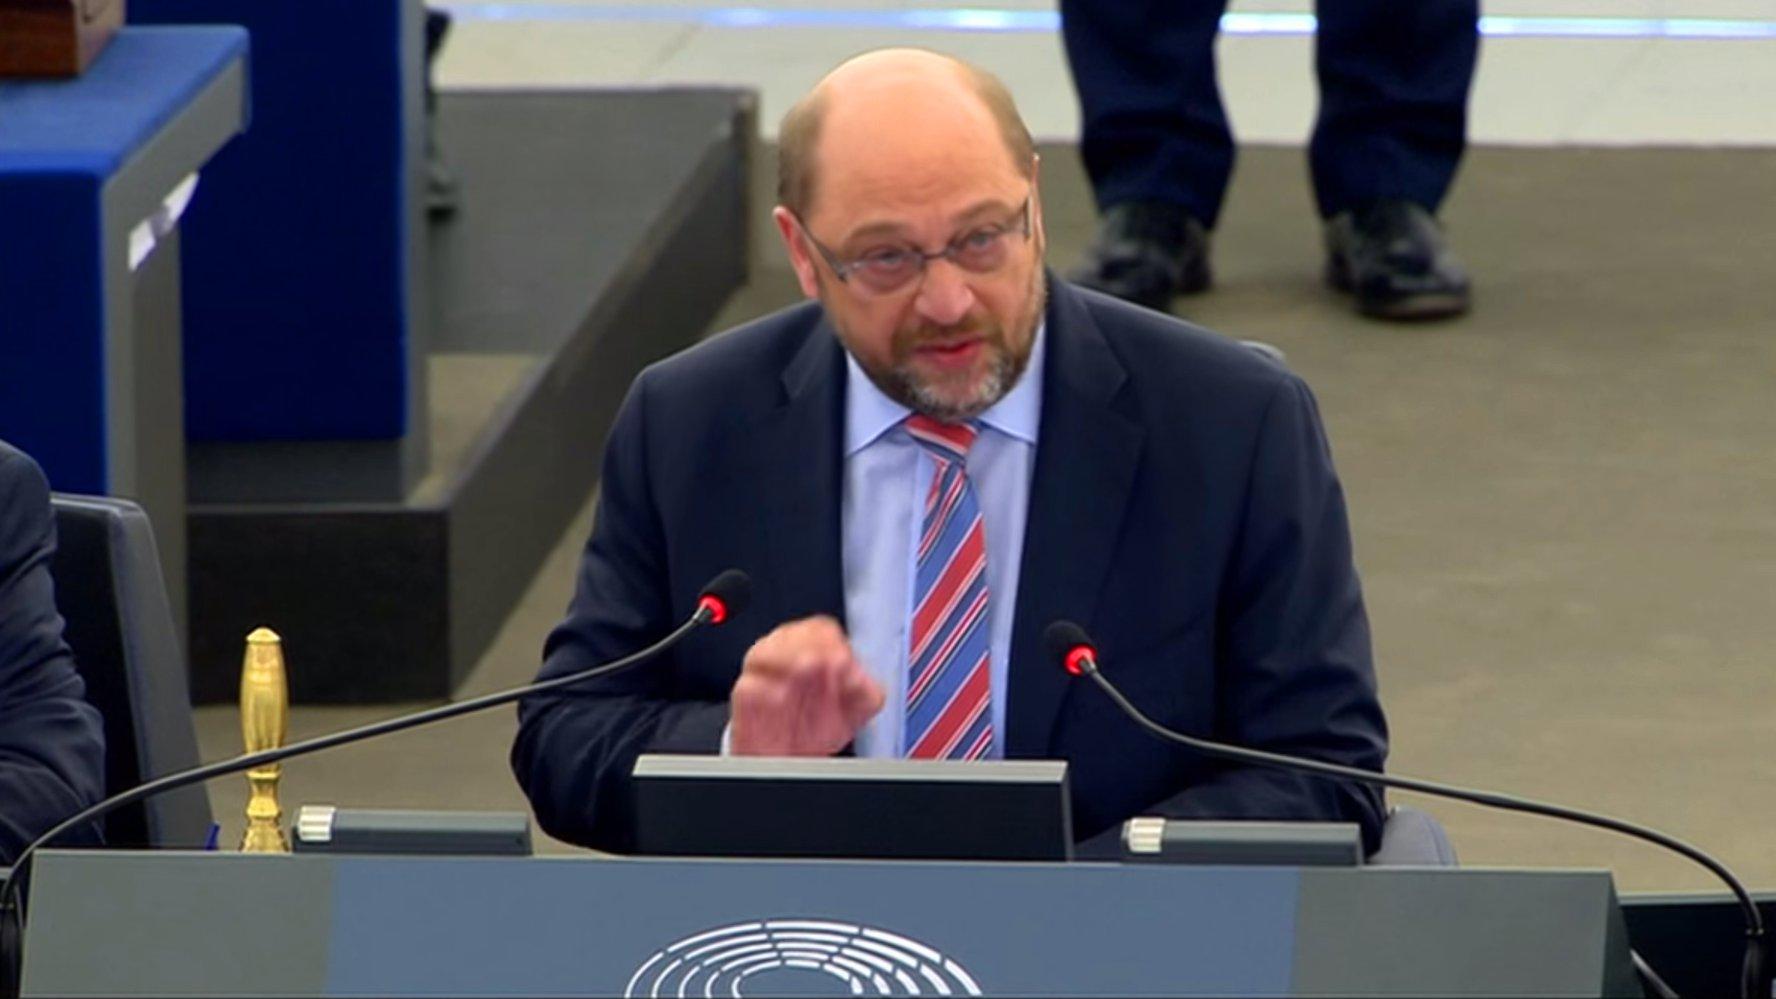 Martin Schulz im Europaparlament, 2016 (Video)